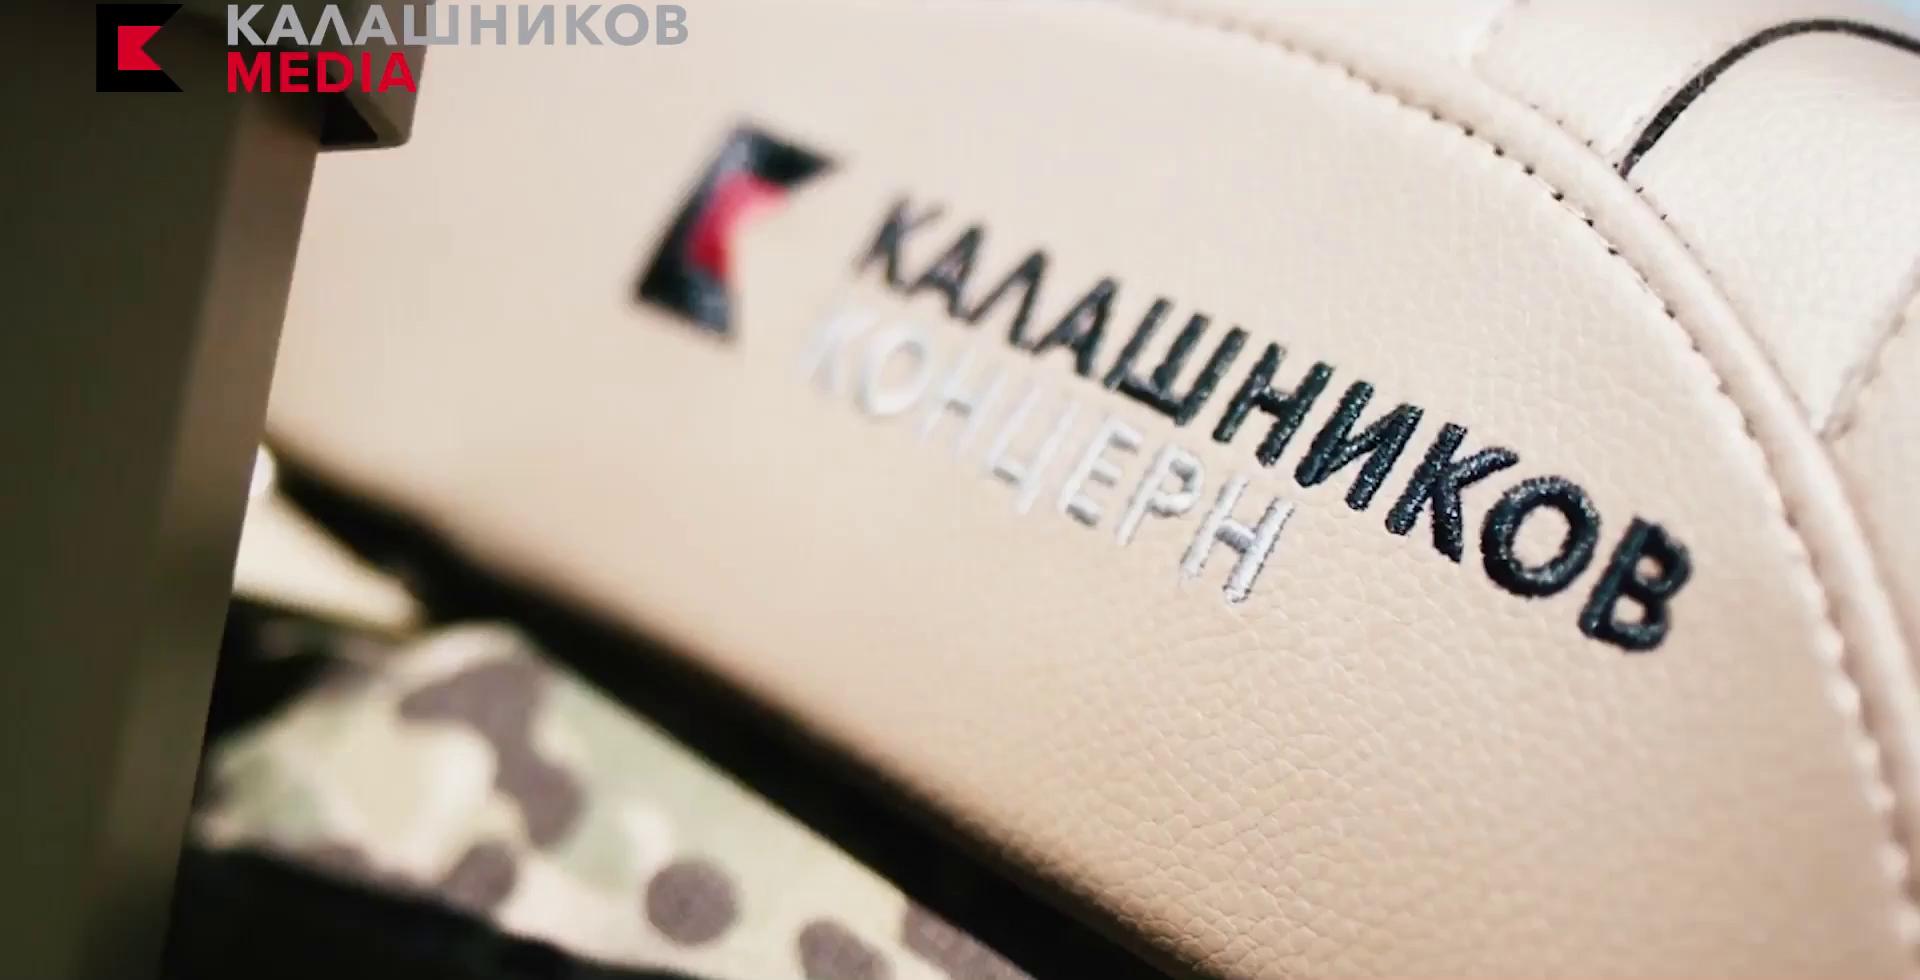 Kalashnikov IZH phiên bản quân đội